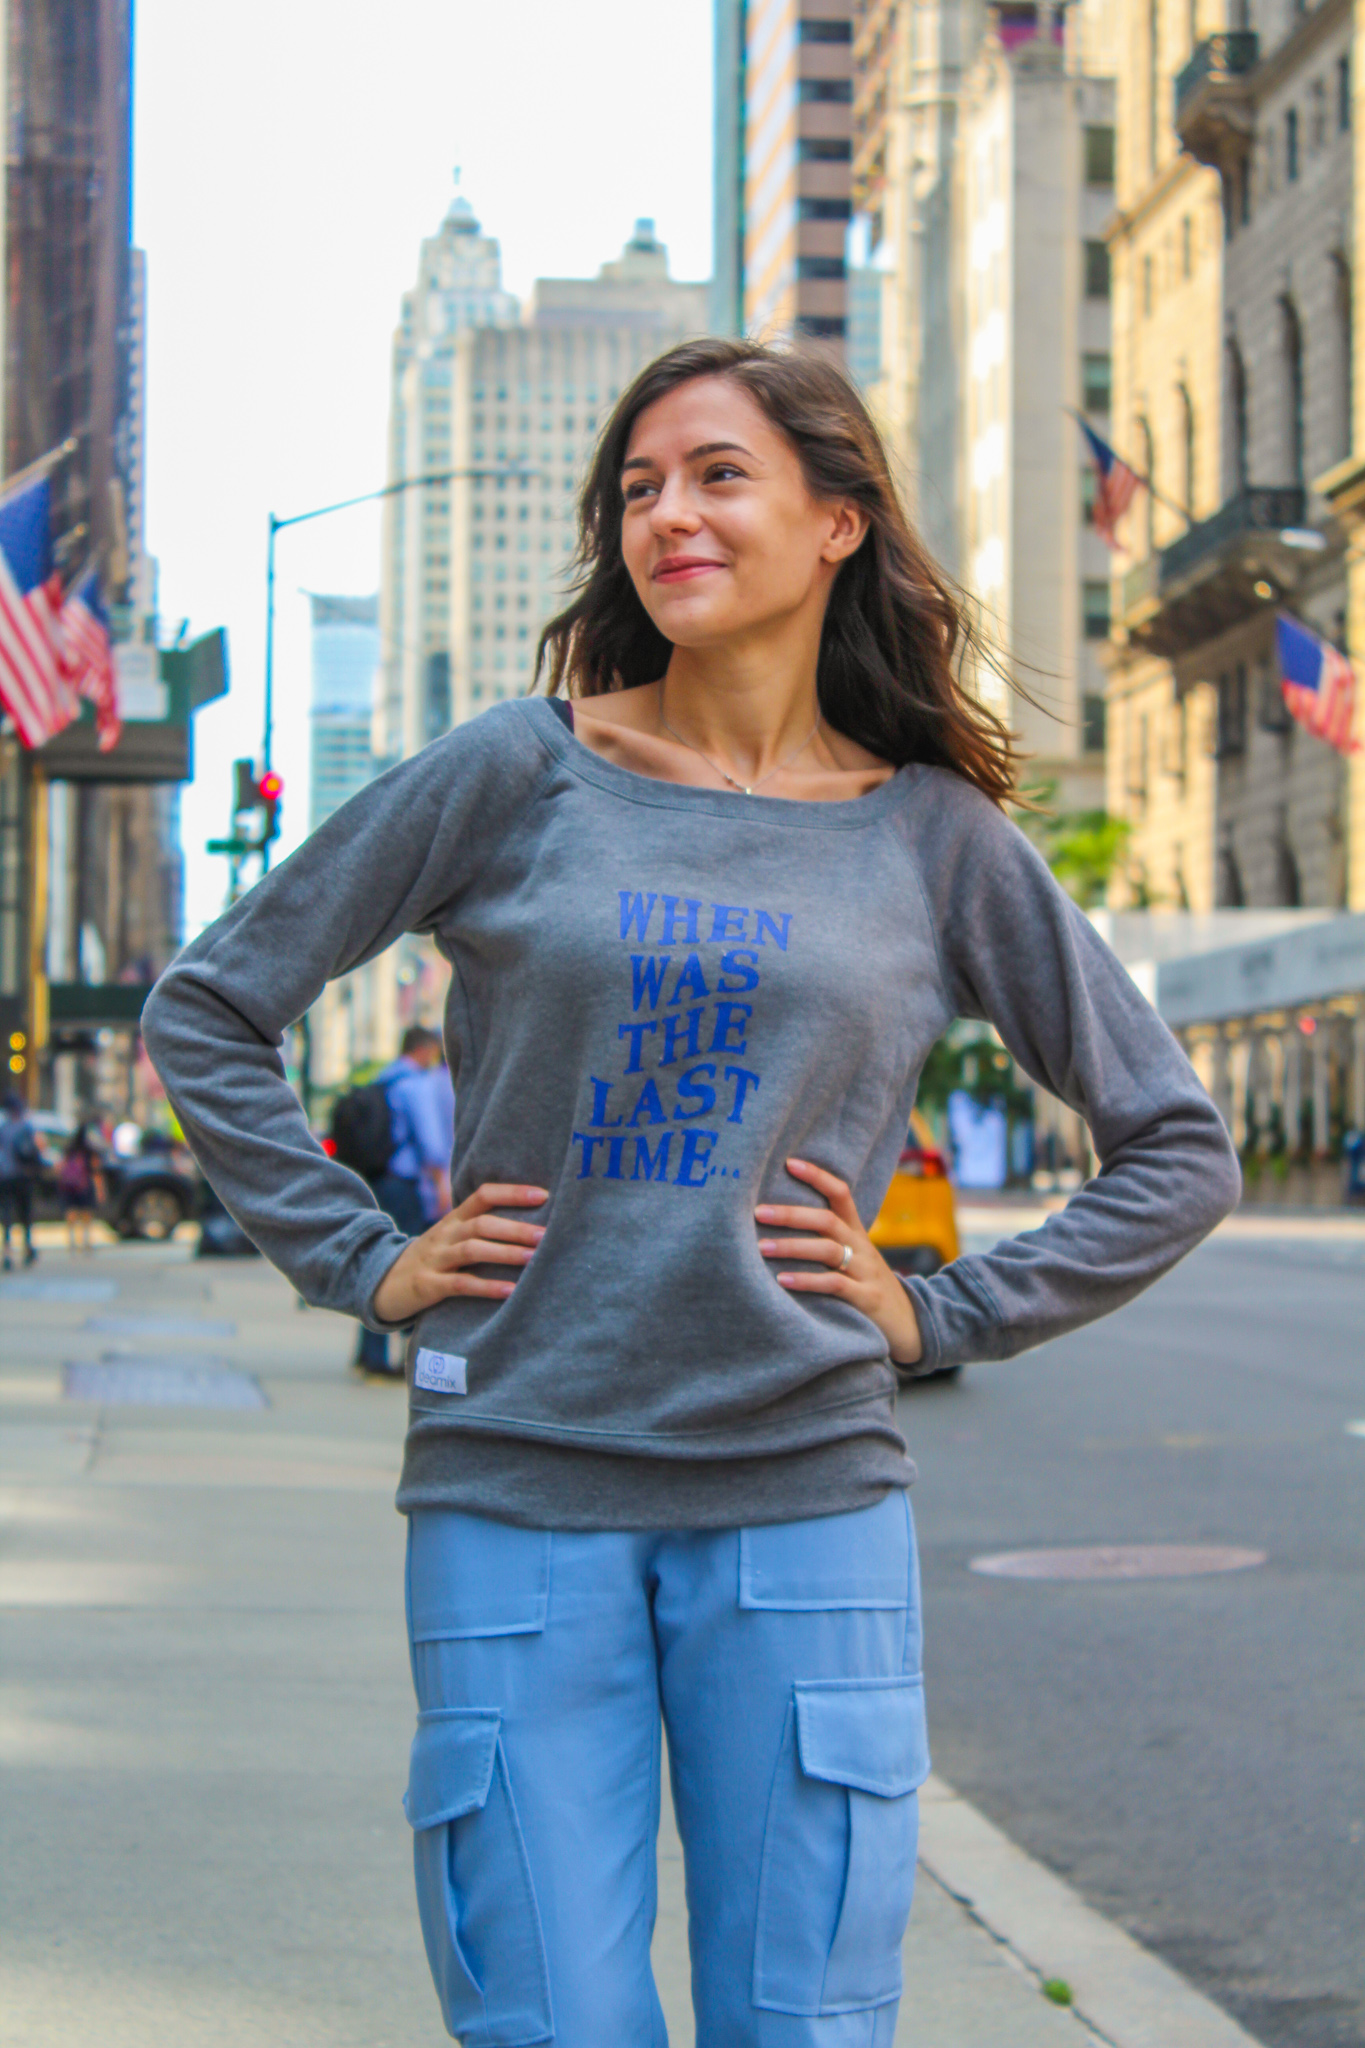 When Was the Last Time Women's Wide Neck Sweatshirt